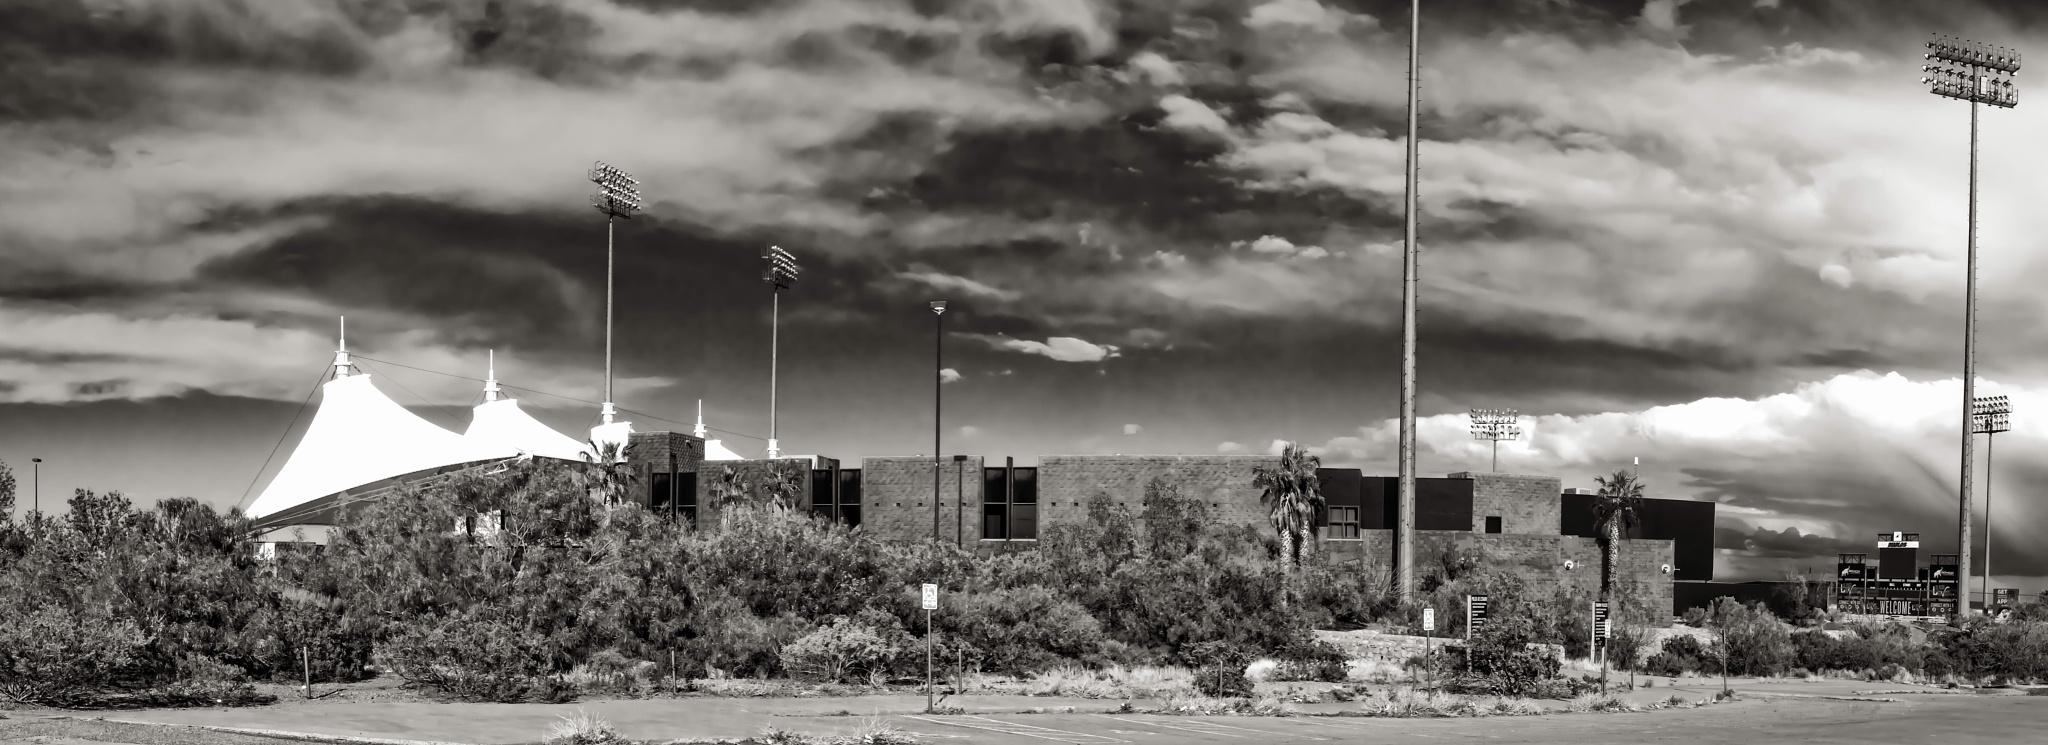 Cohen Stadium-El Paso, Texas by BarbMcCourt